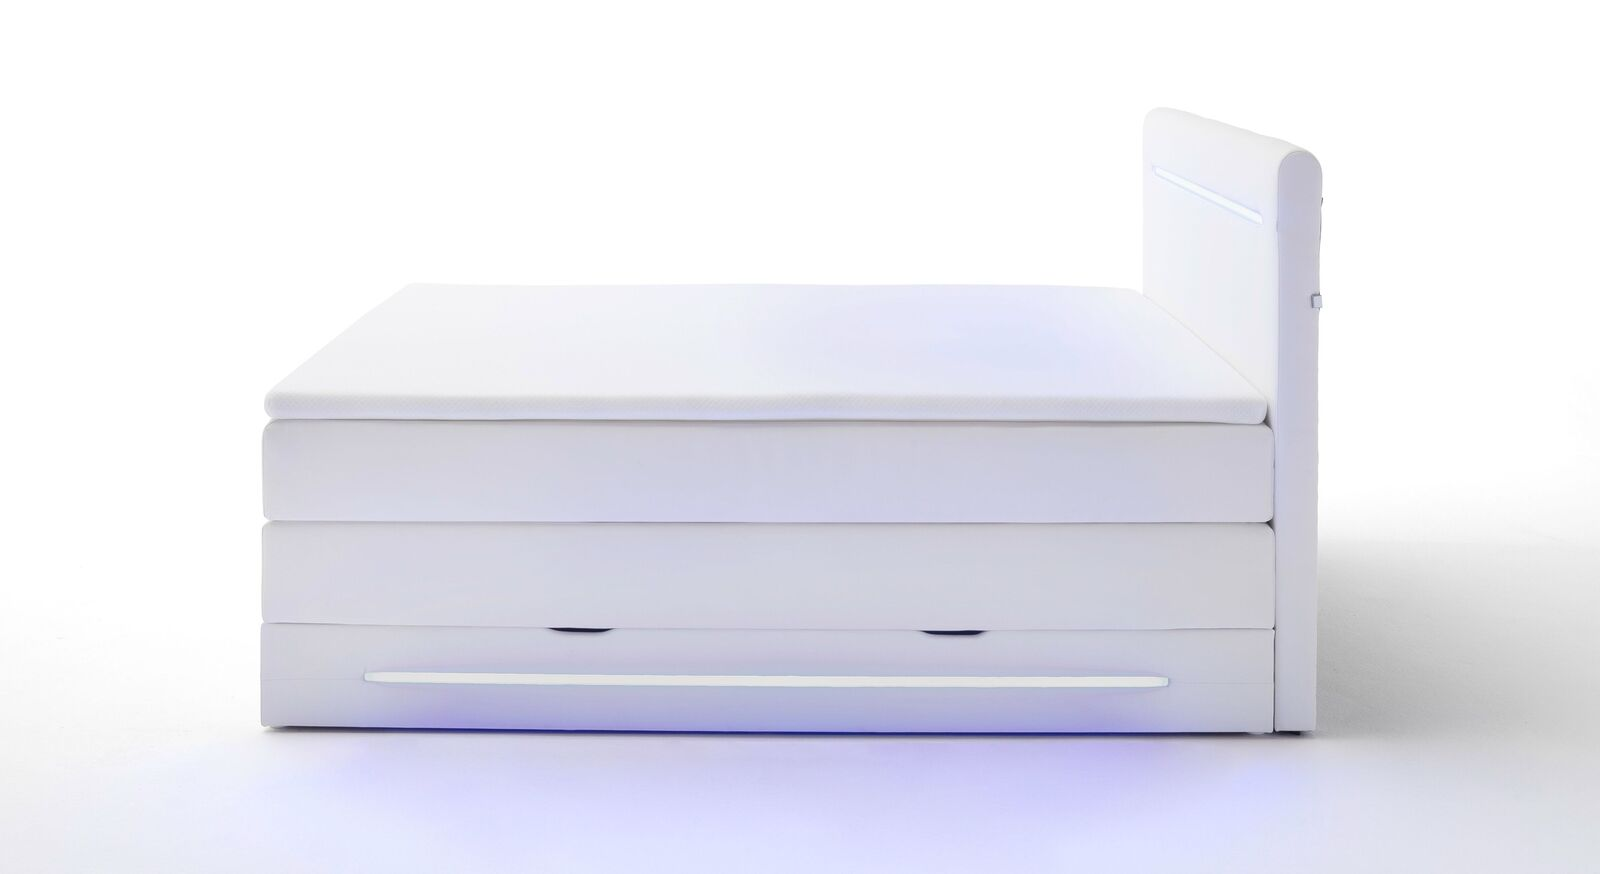 Bettkasten-Boxspringbett Tarasco mit moderner Beleuchtung